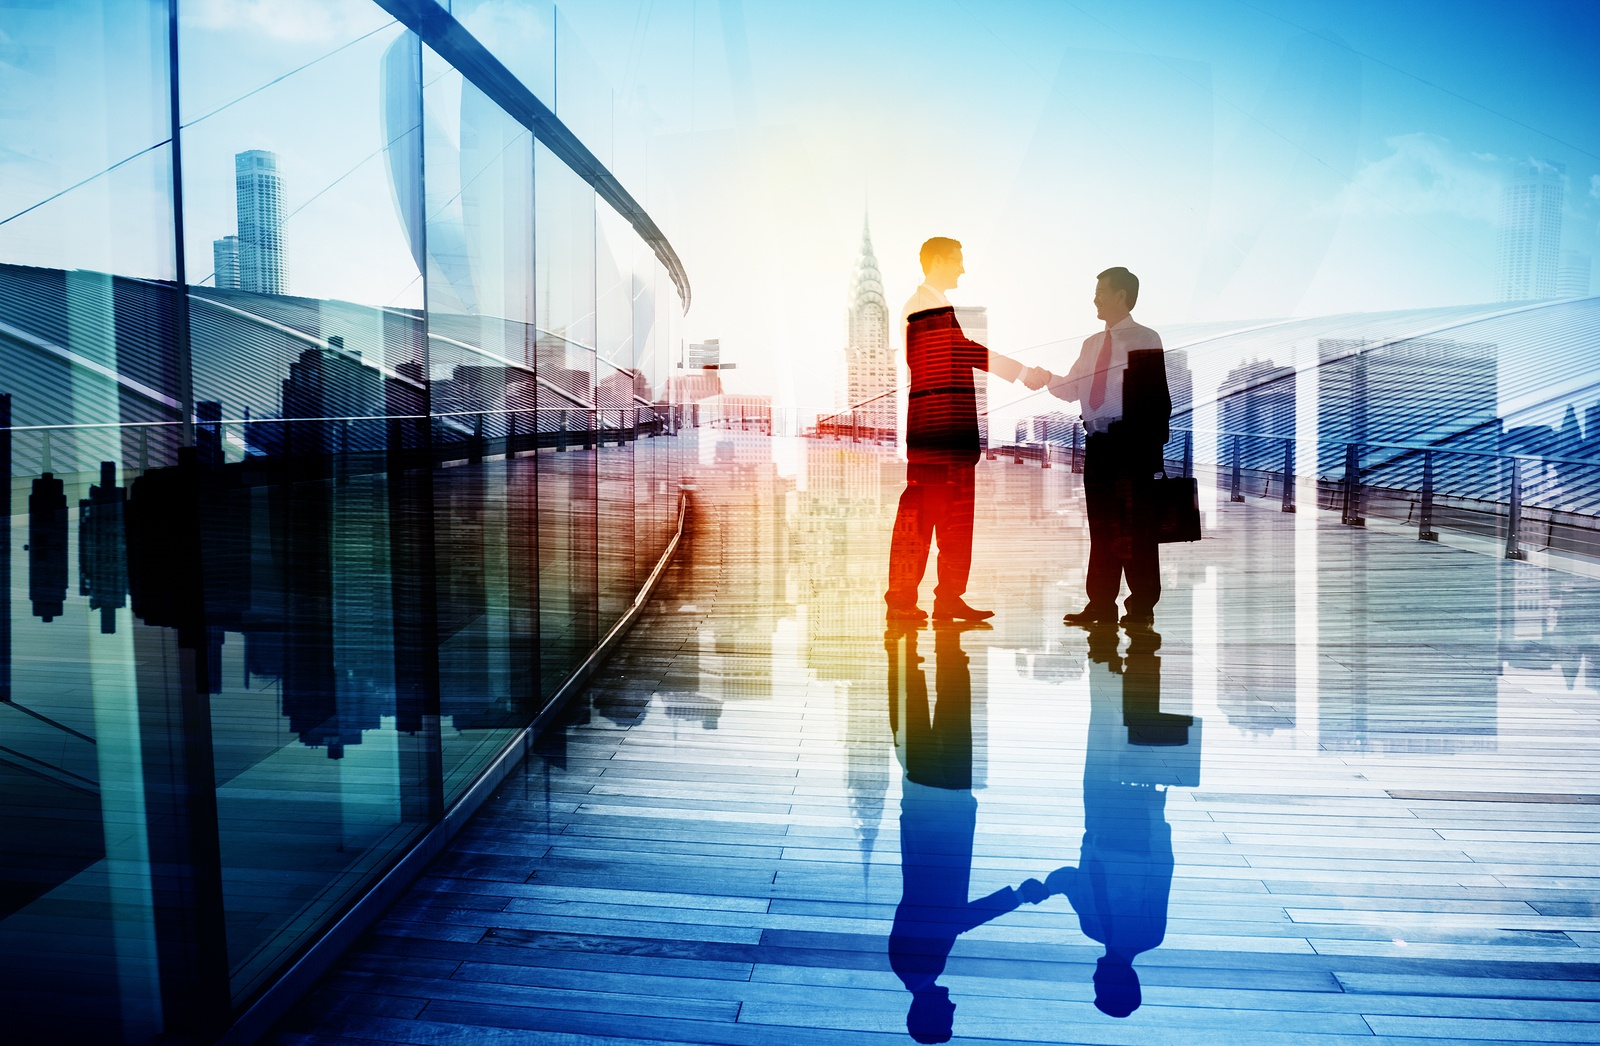 bigstock-Business-People-Hand-Shake-Par-80738645.jpg